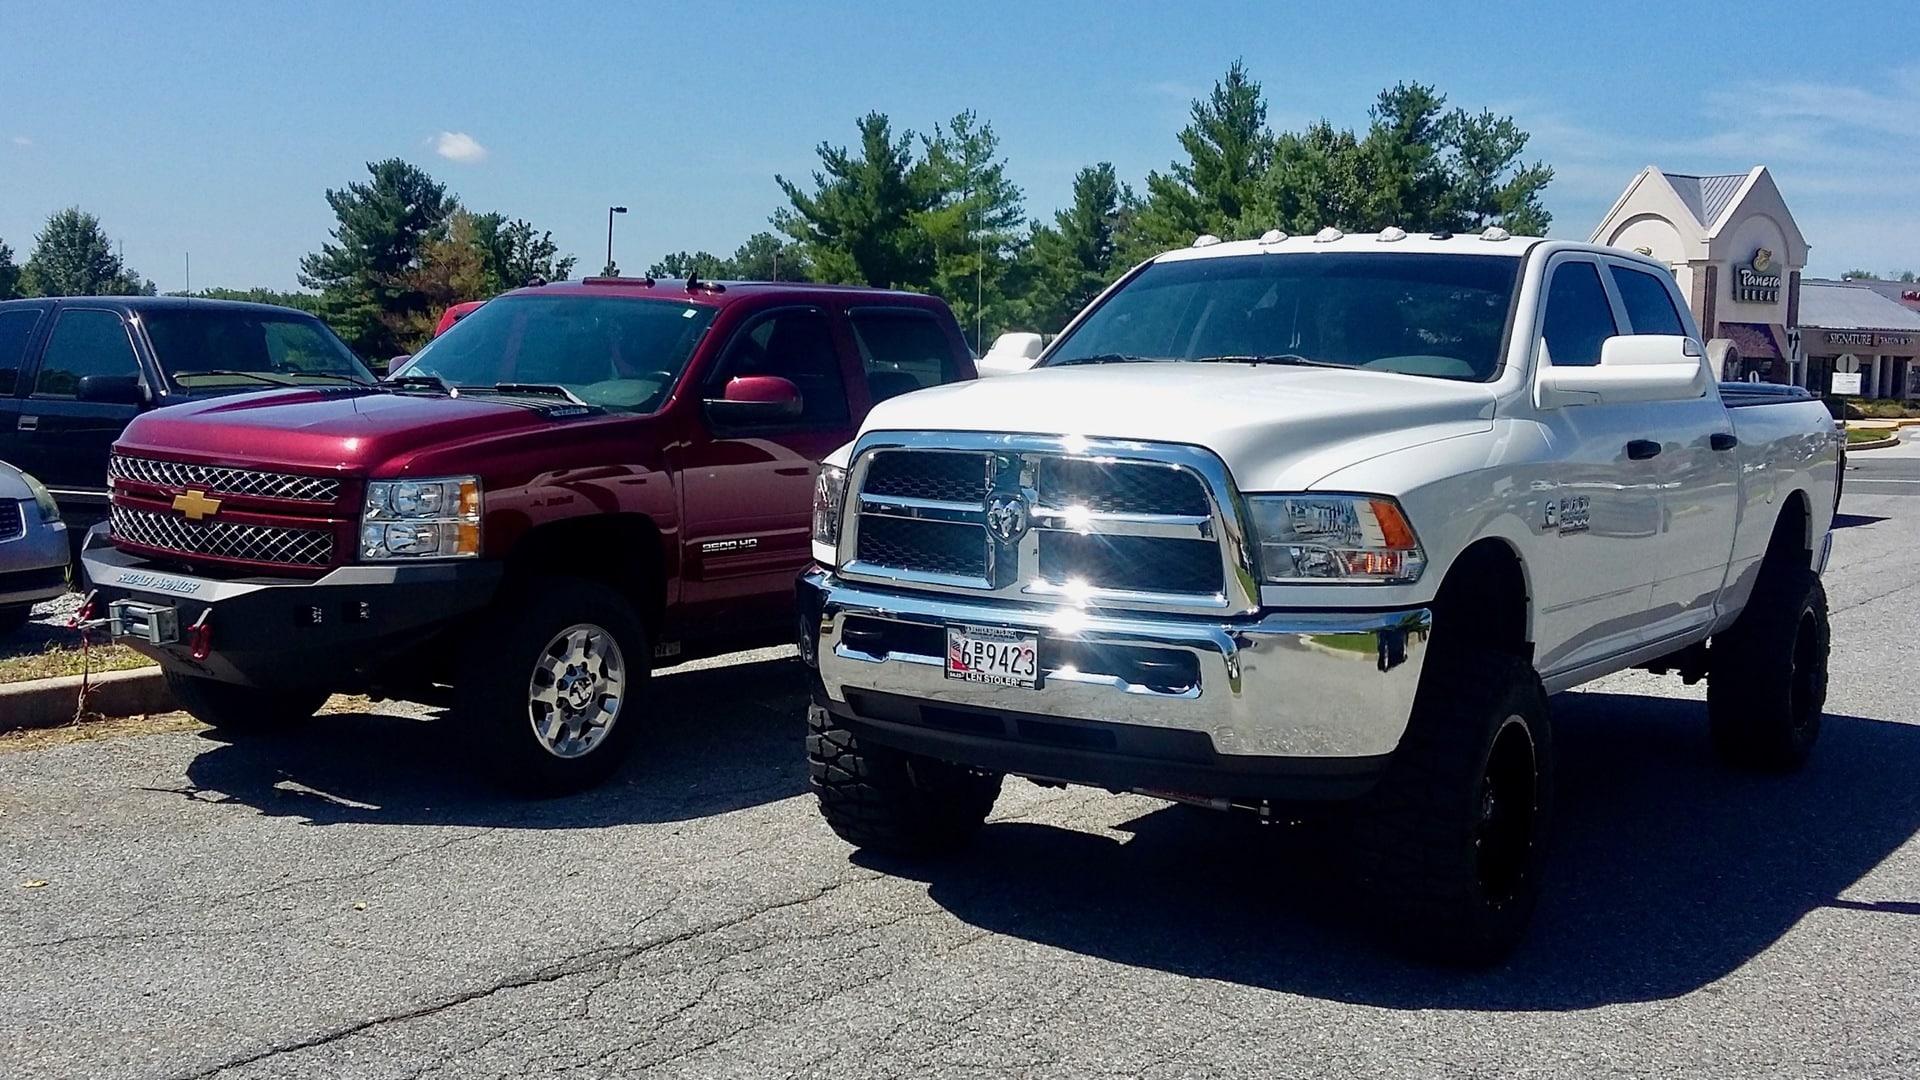 Ram 2500 Lift Kit >> Dodge Ram 2500 Truck Lift Kit - C&A Automotive